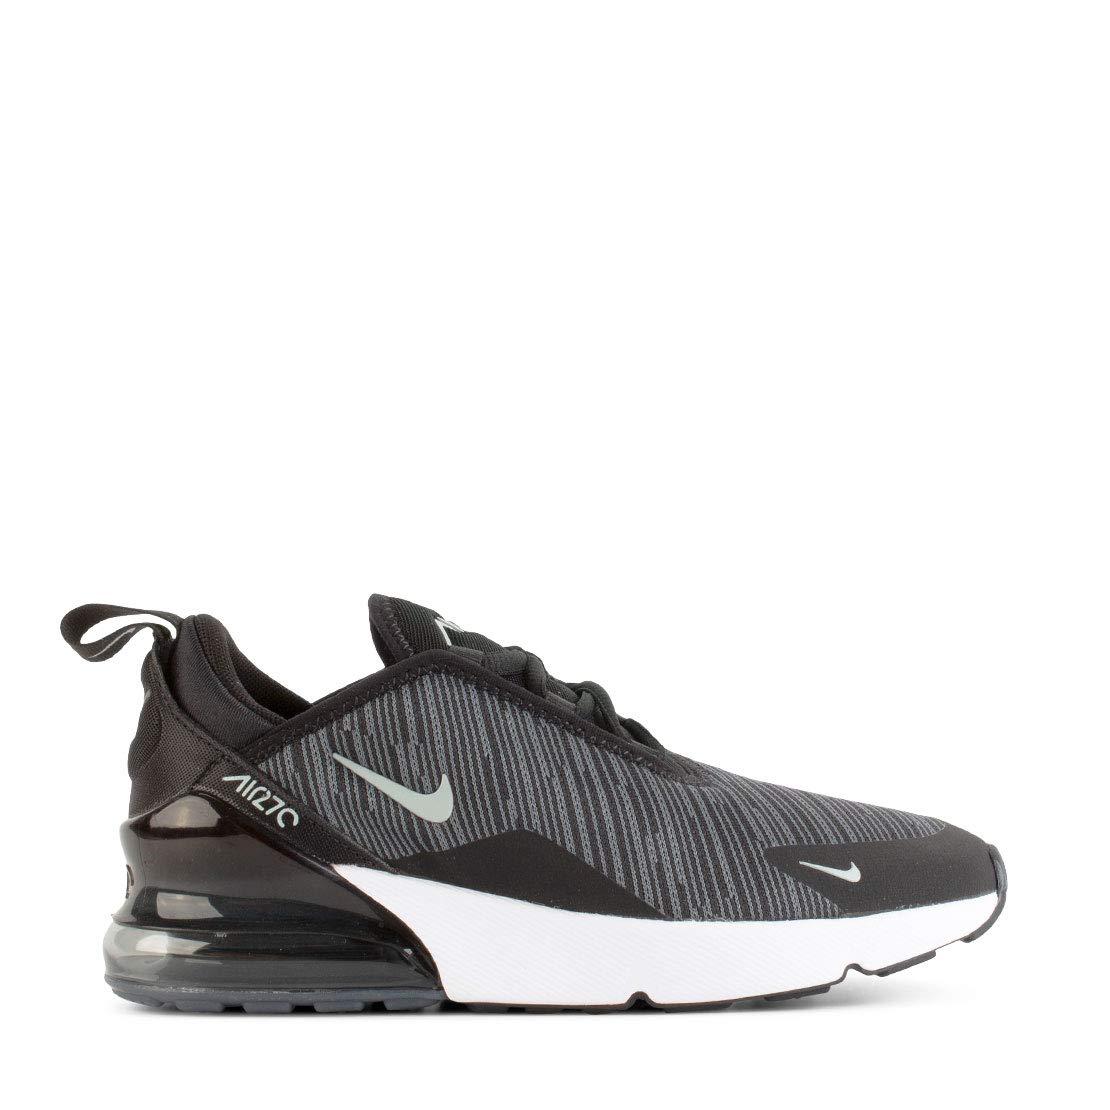 Nike Air Max 270 (PS) Boys' Pre School Running Shoes AO2372 008 (2Y)